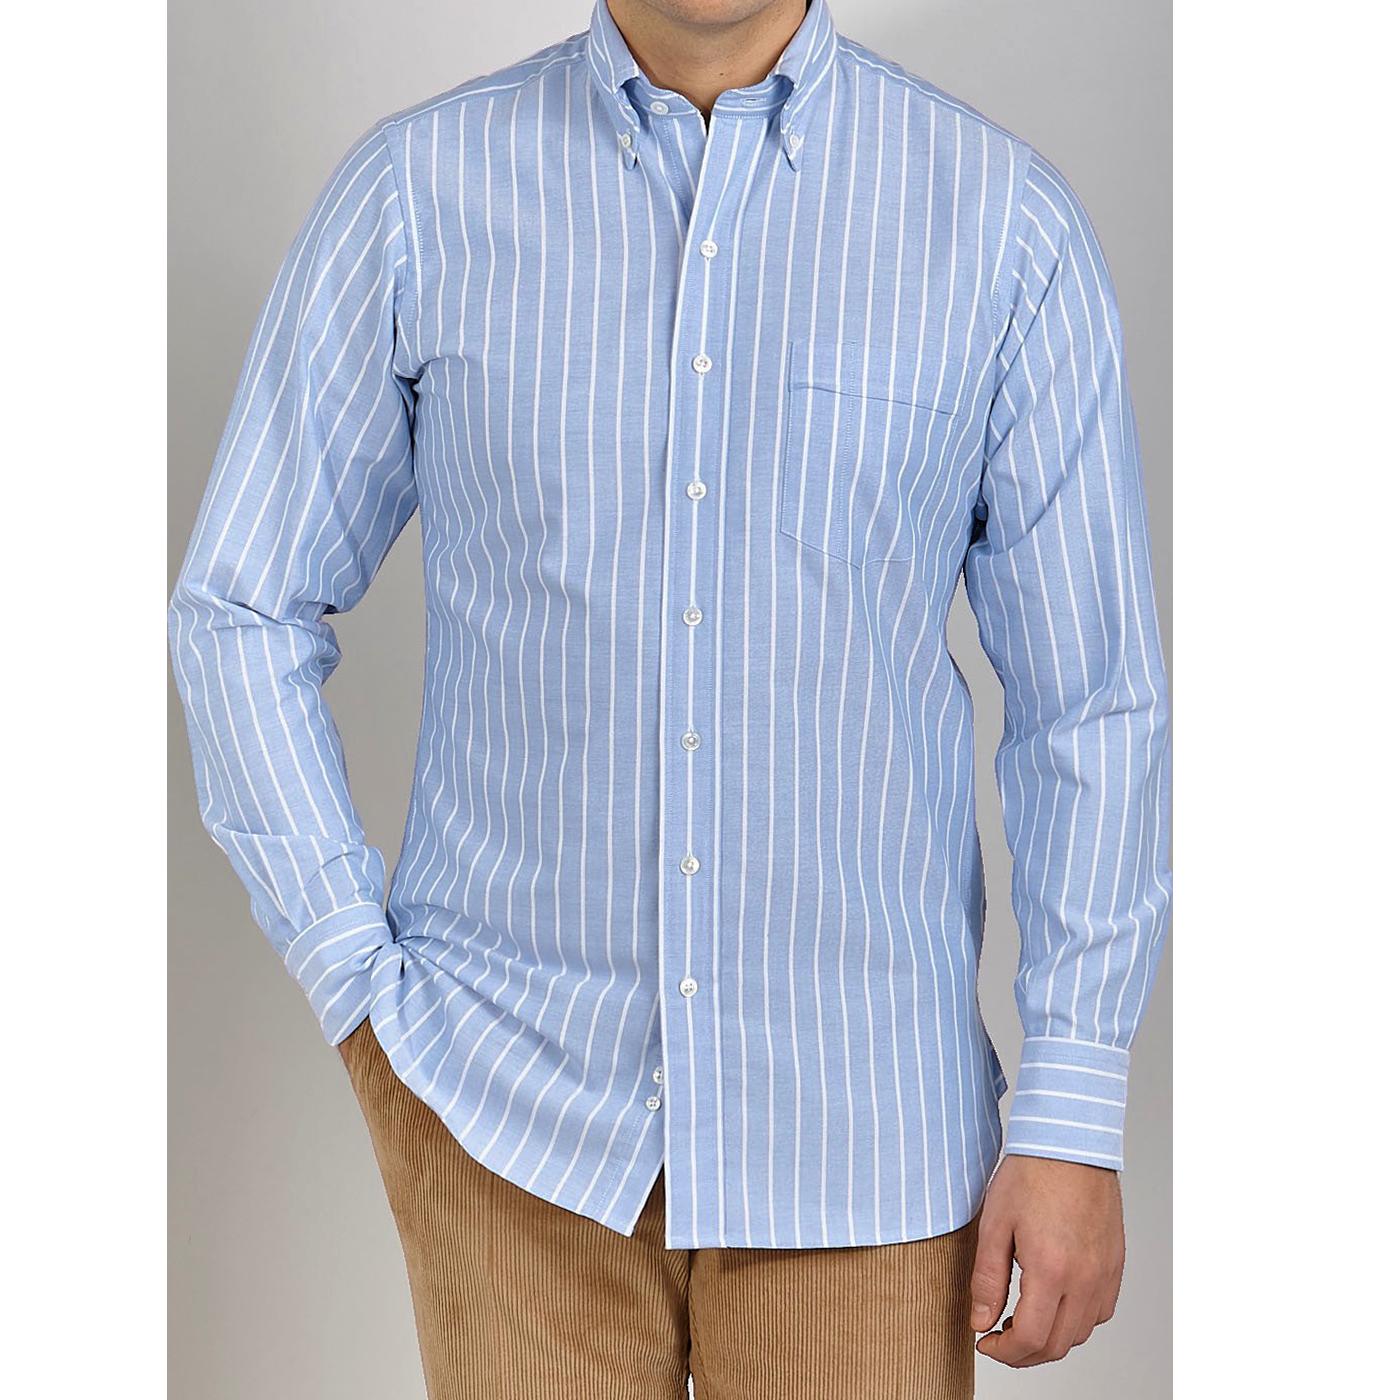 Drake's Blue Wide Striped Cotton Oxford BD Shirt Front